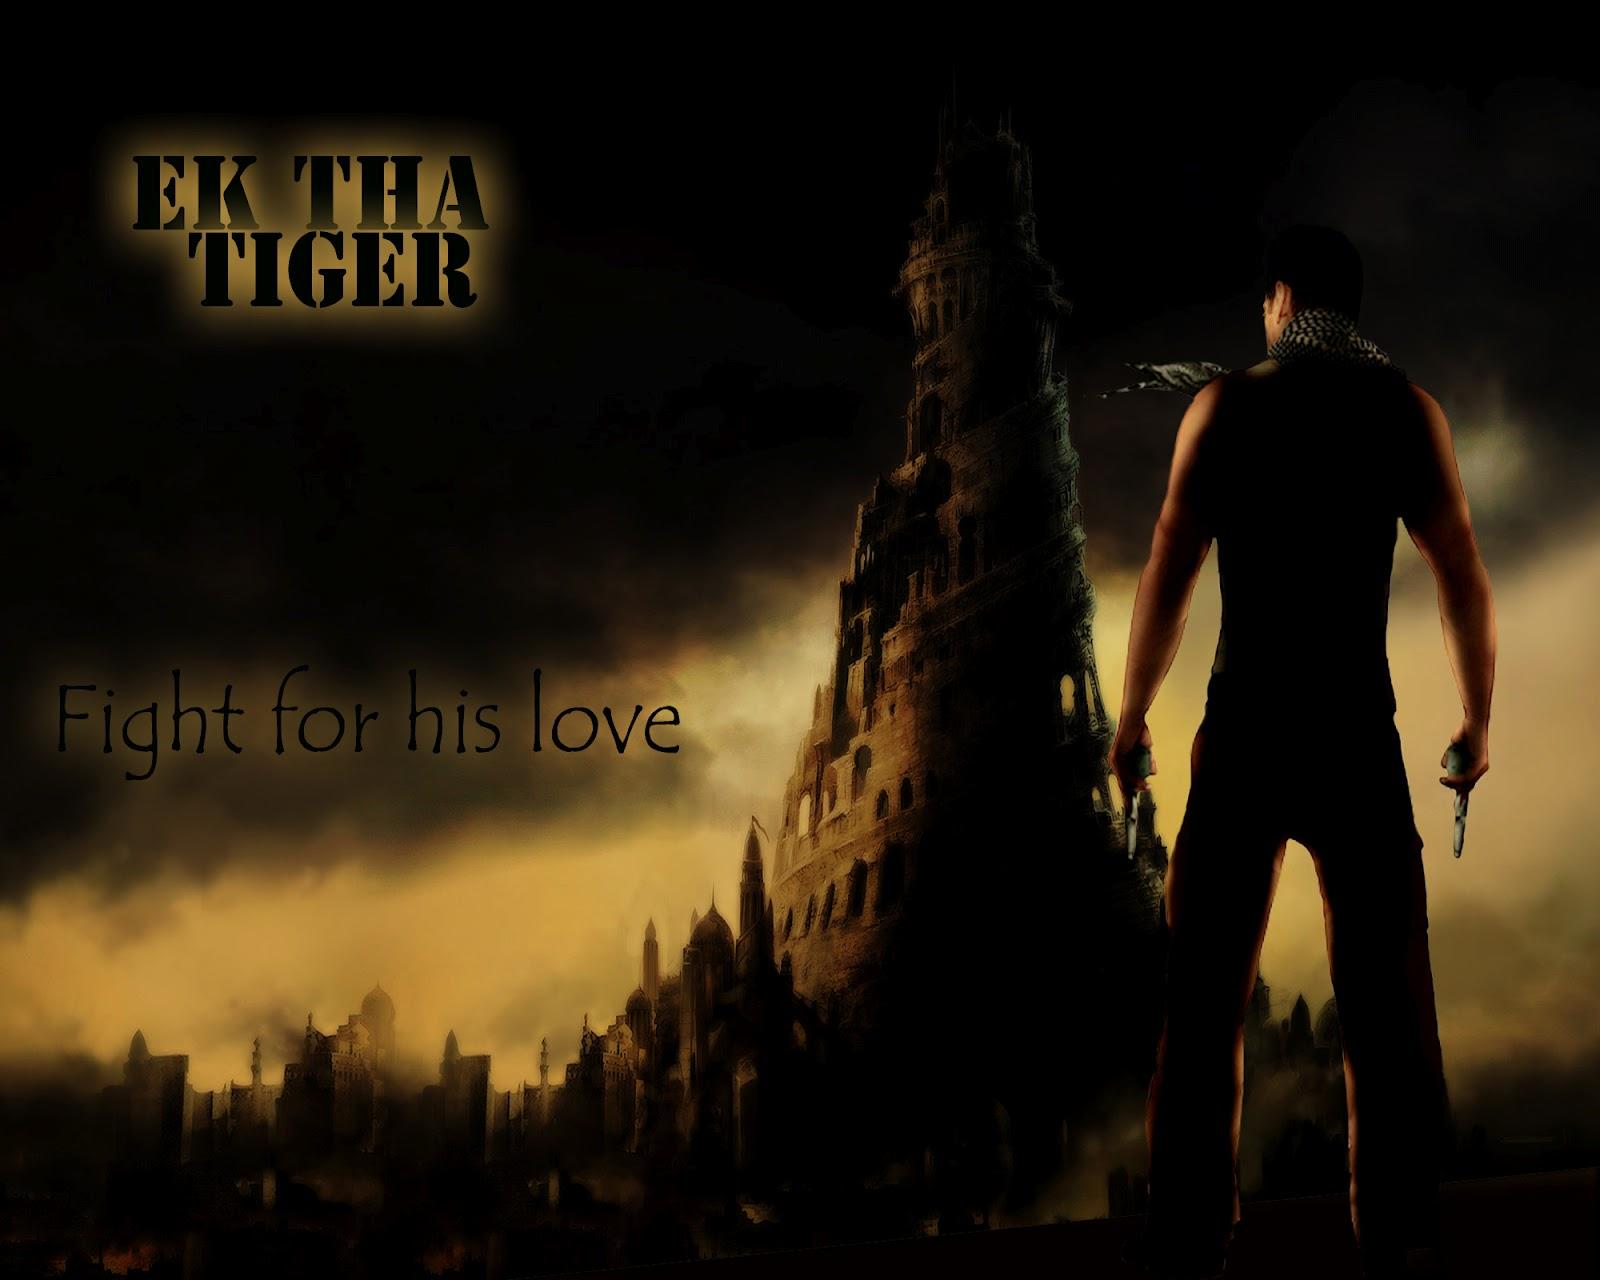 http://2.bp.blogspot.com/-CAiNrc43uO4/UBNTSVPIDQI/AAAAAAAAC0Y/tvwYwyHBSiE/s1600/Ek+Tha+Tiger+Movie18.jpg